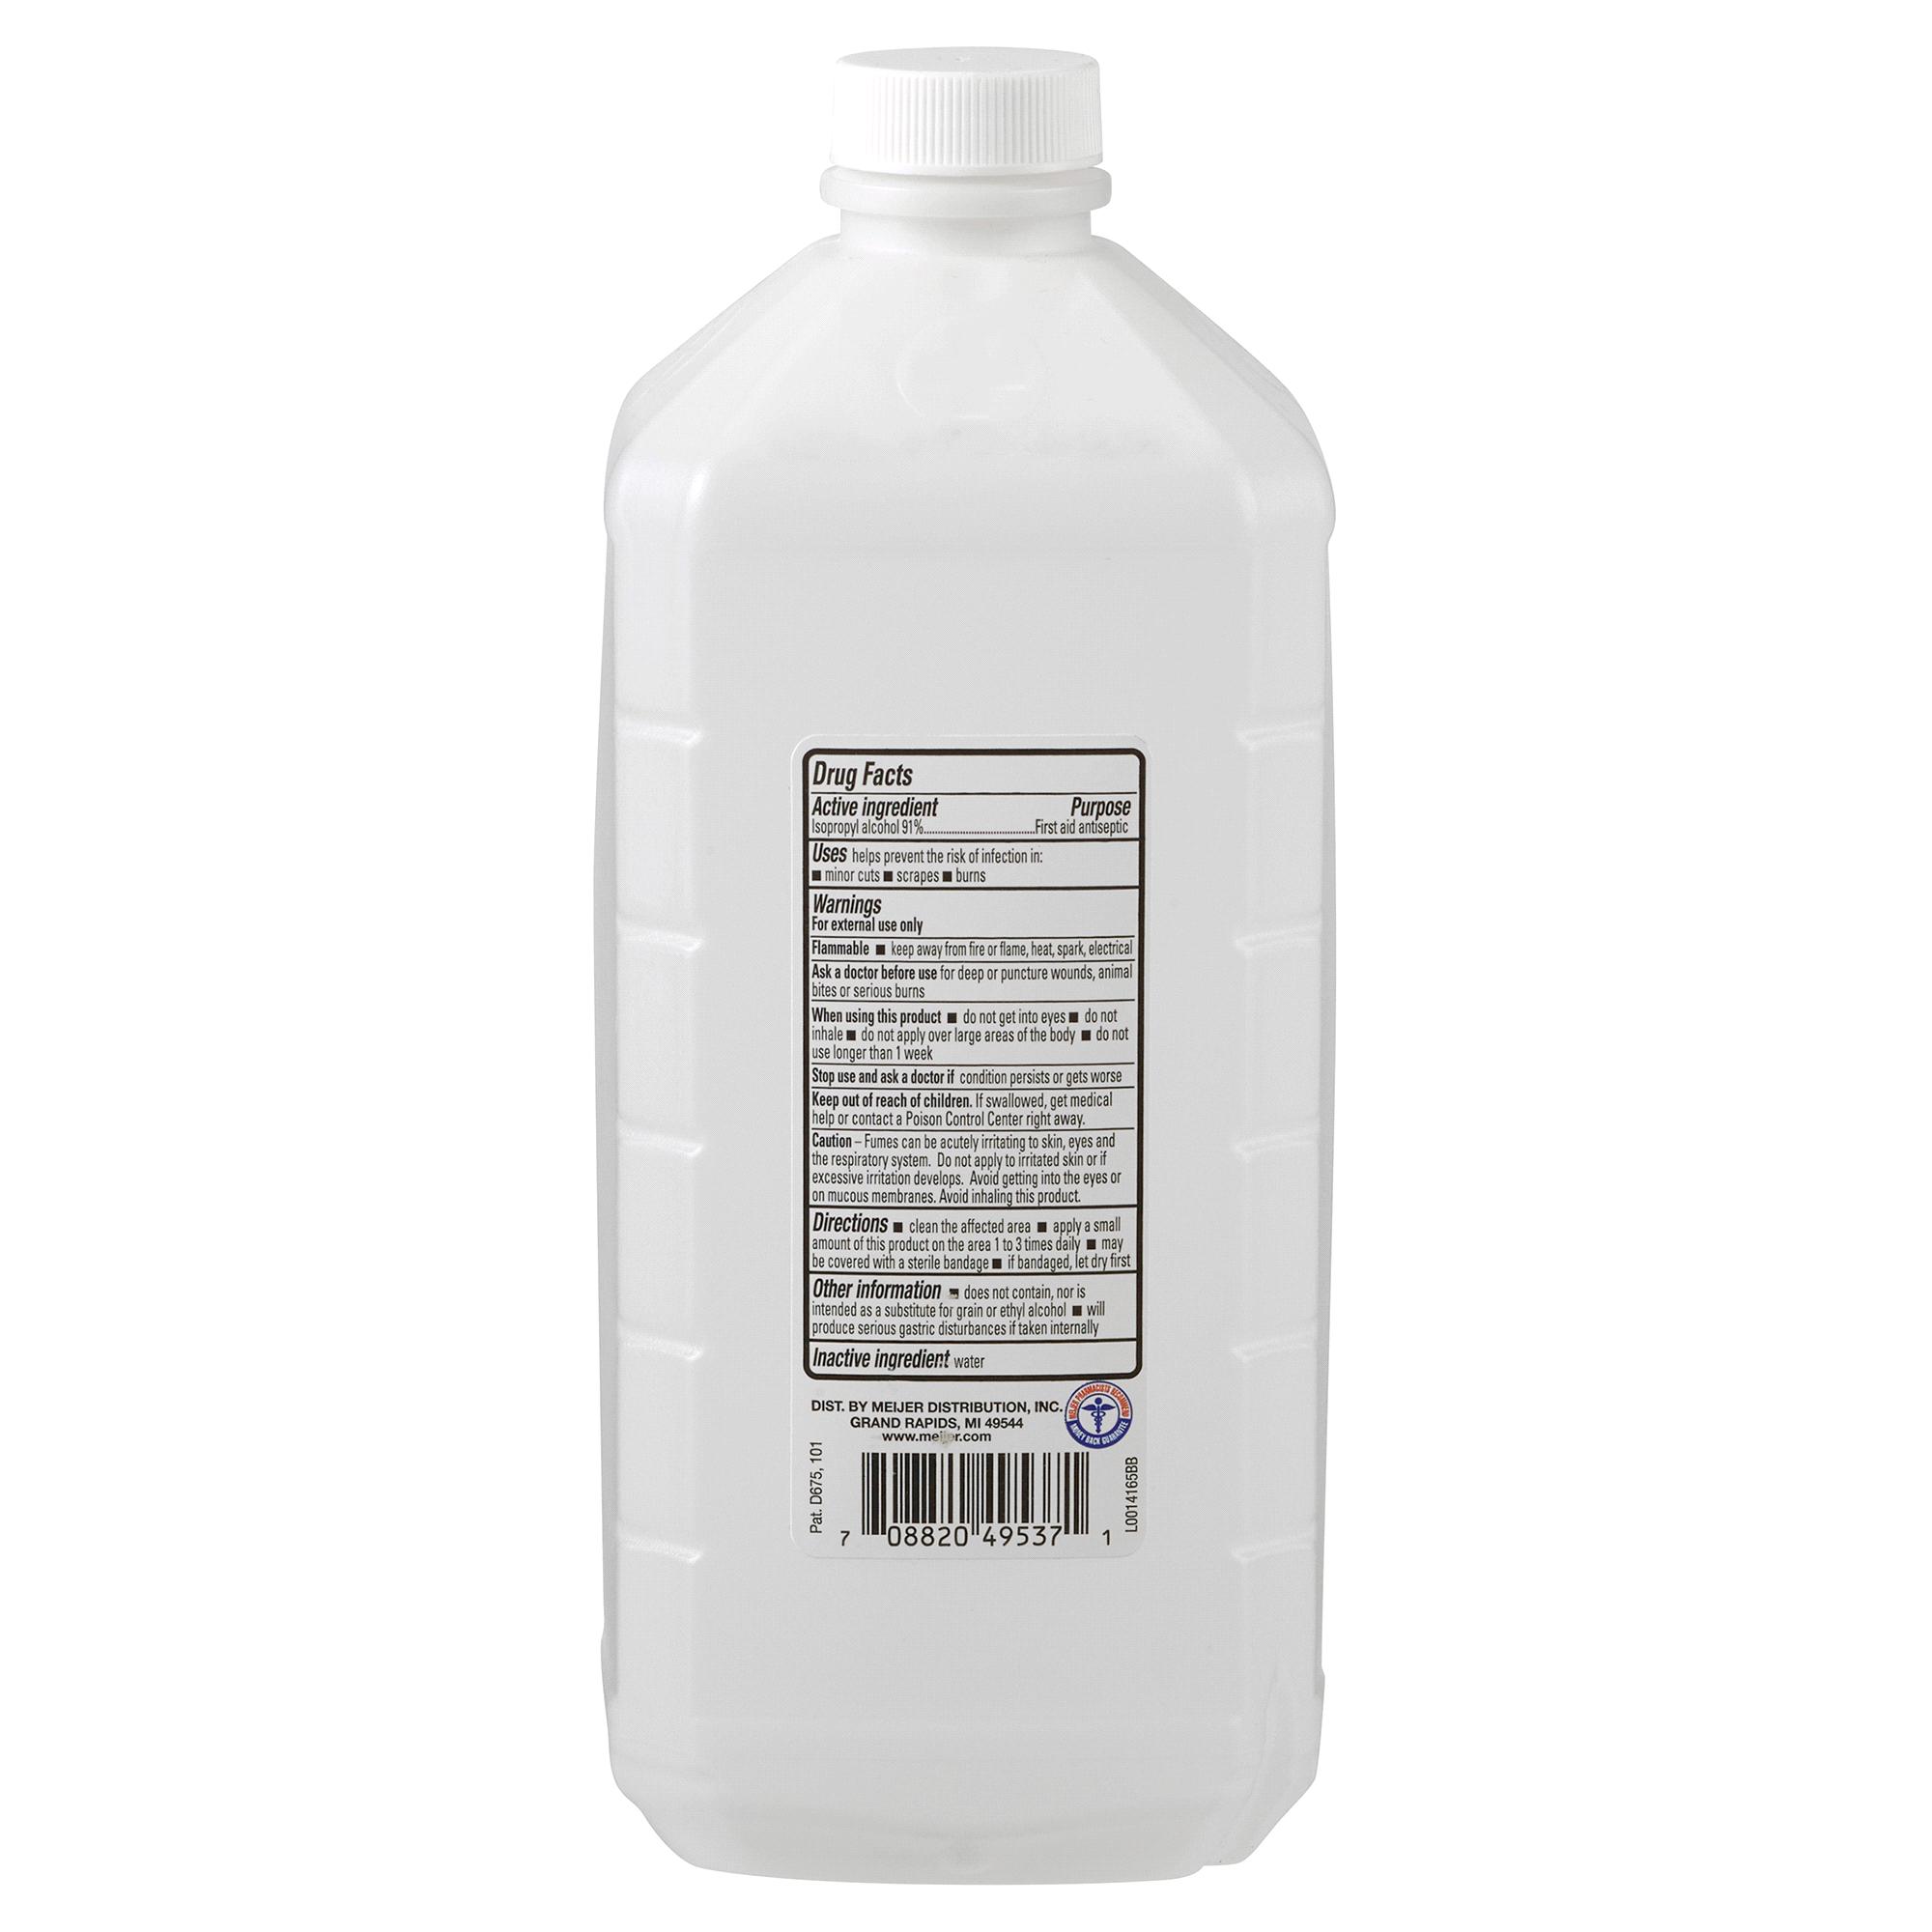 70 Isopropyl Alcohol First Aid Antiseptic 16 Oz Aseptic Gel Alkohol Antiseptik